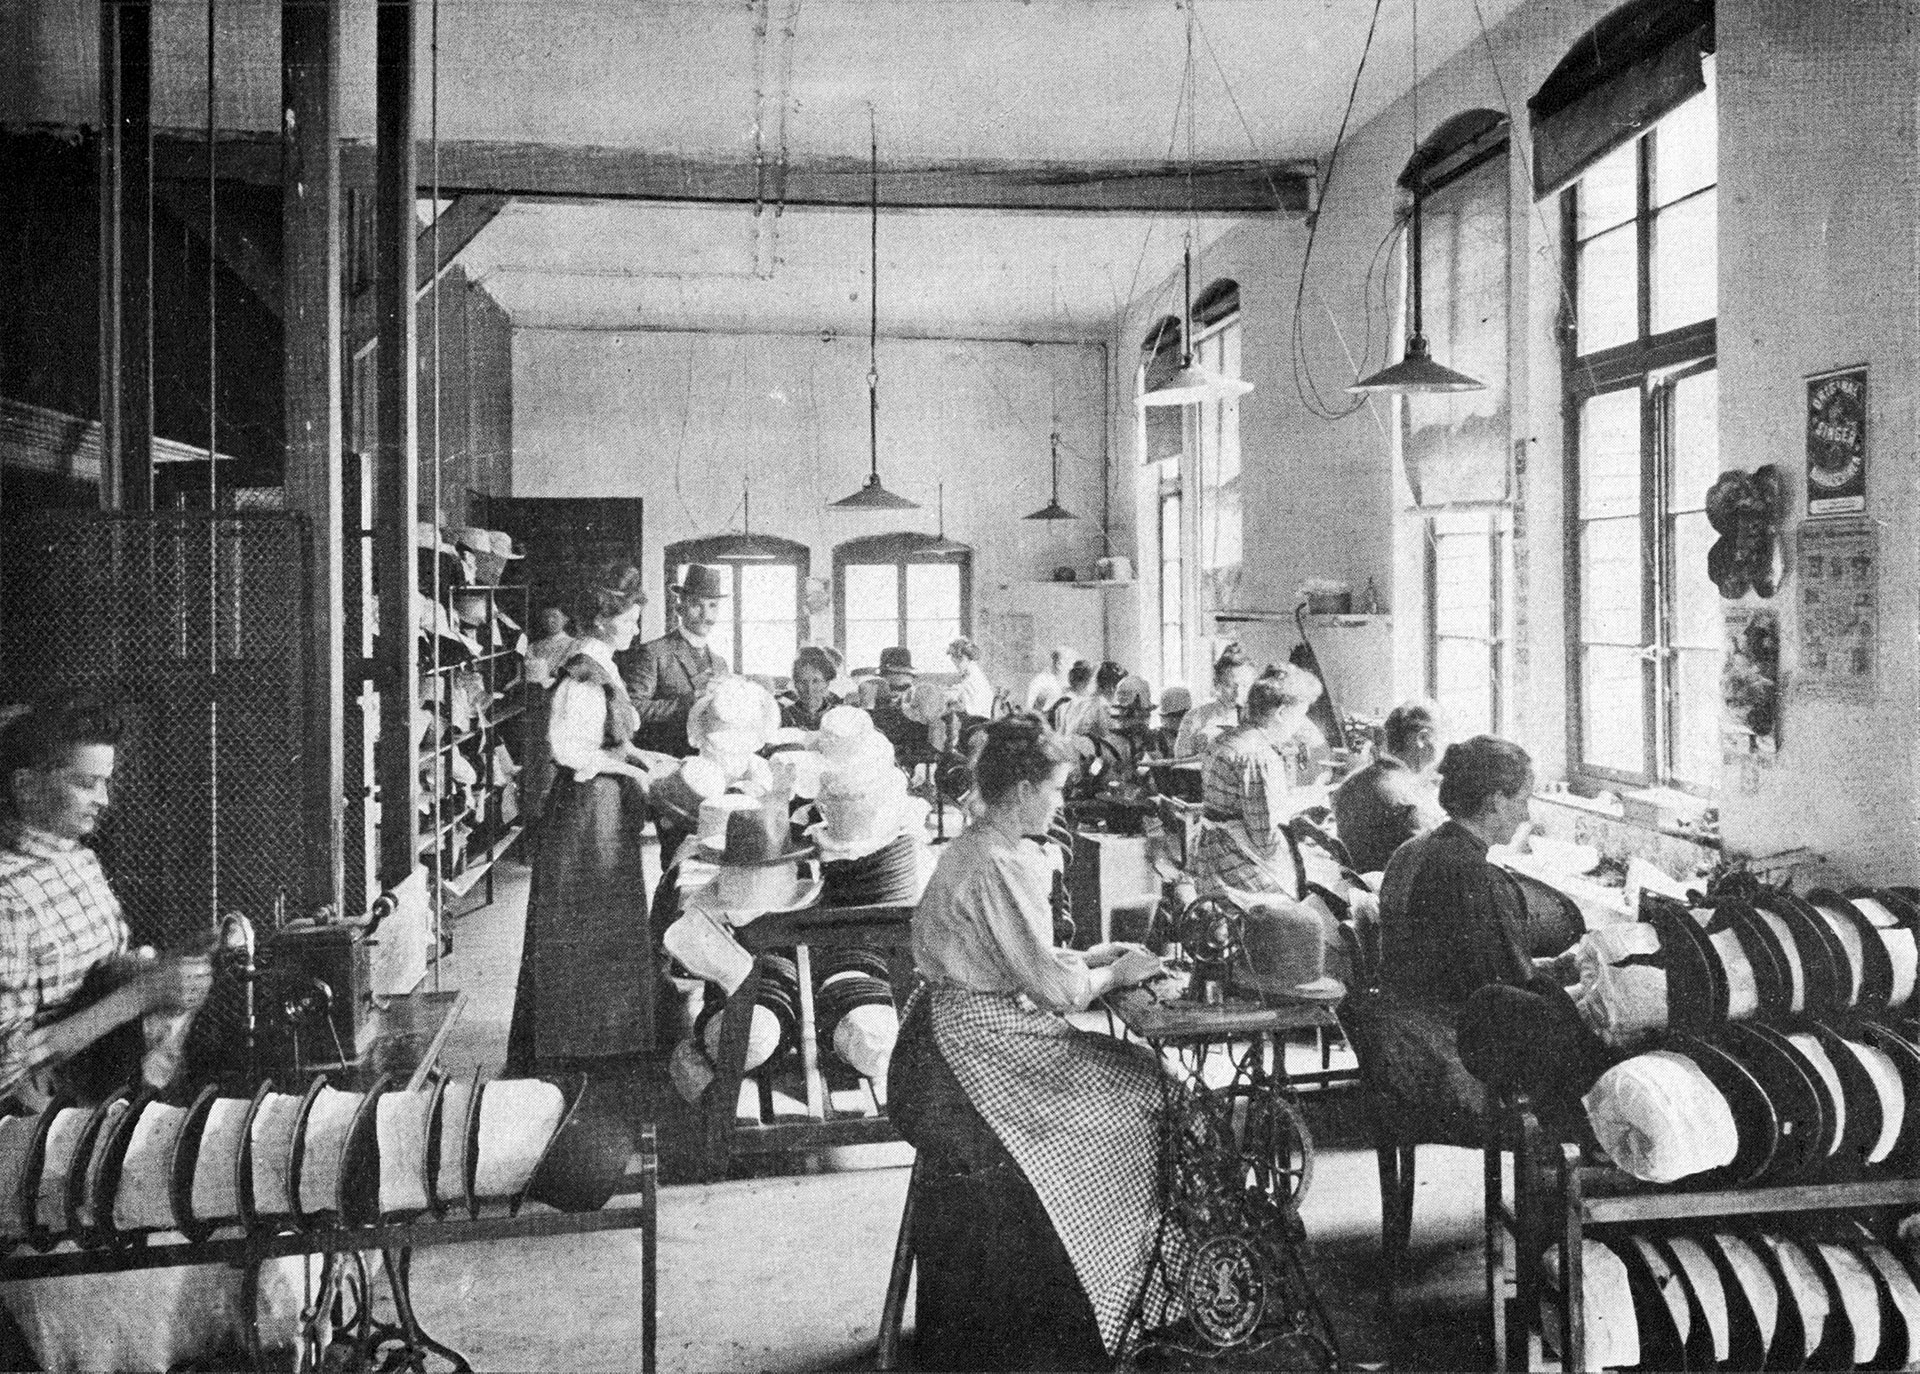 WE_history_fabrik-garniersaal_300-RGBAkCs30tJthtL3